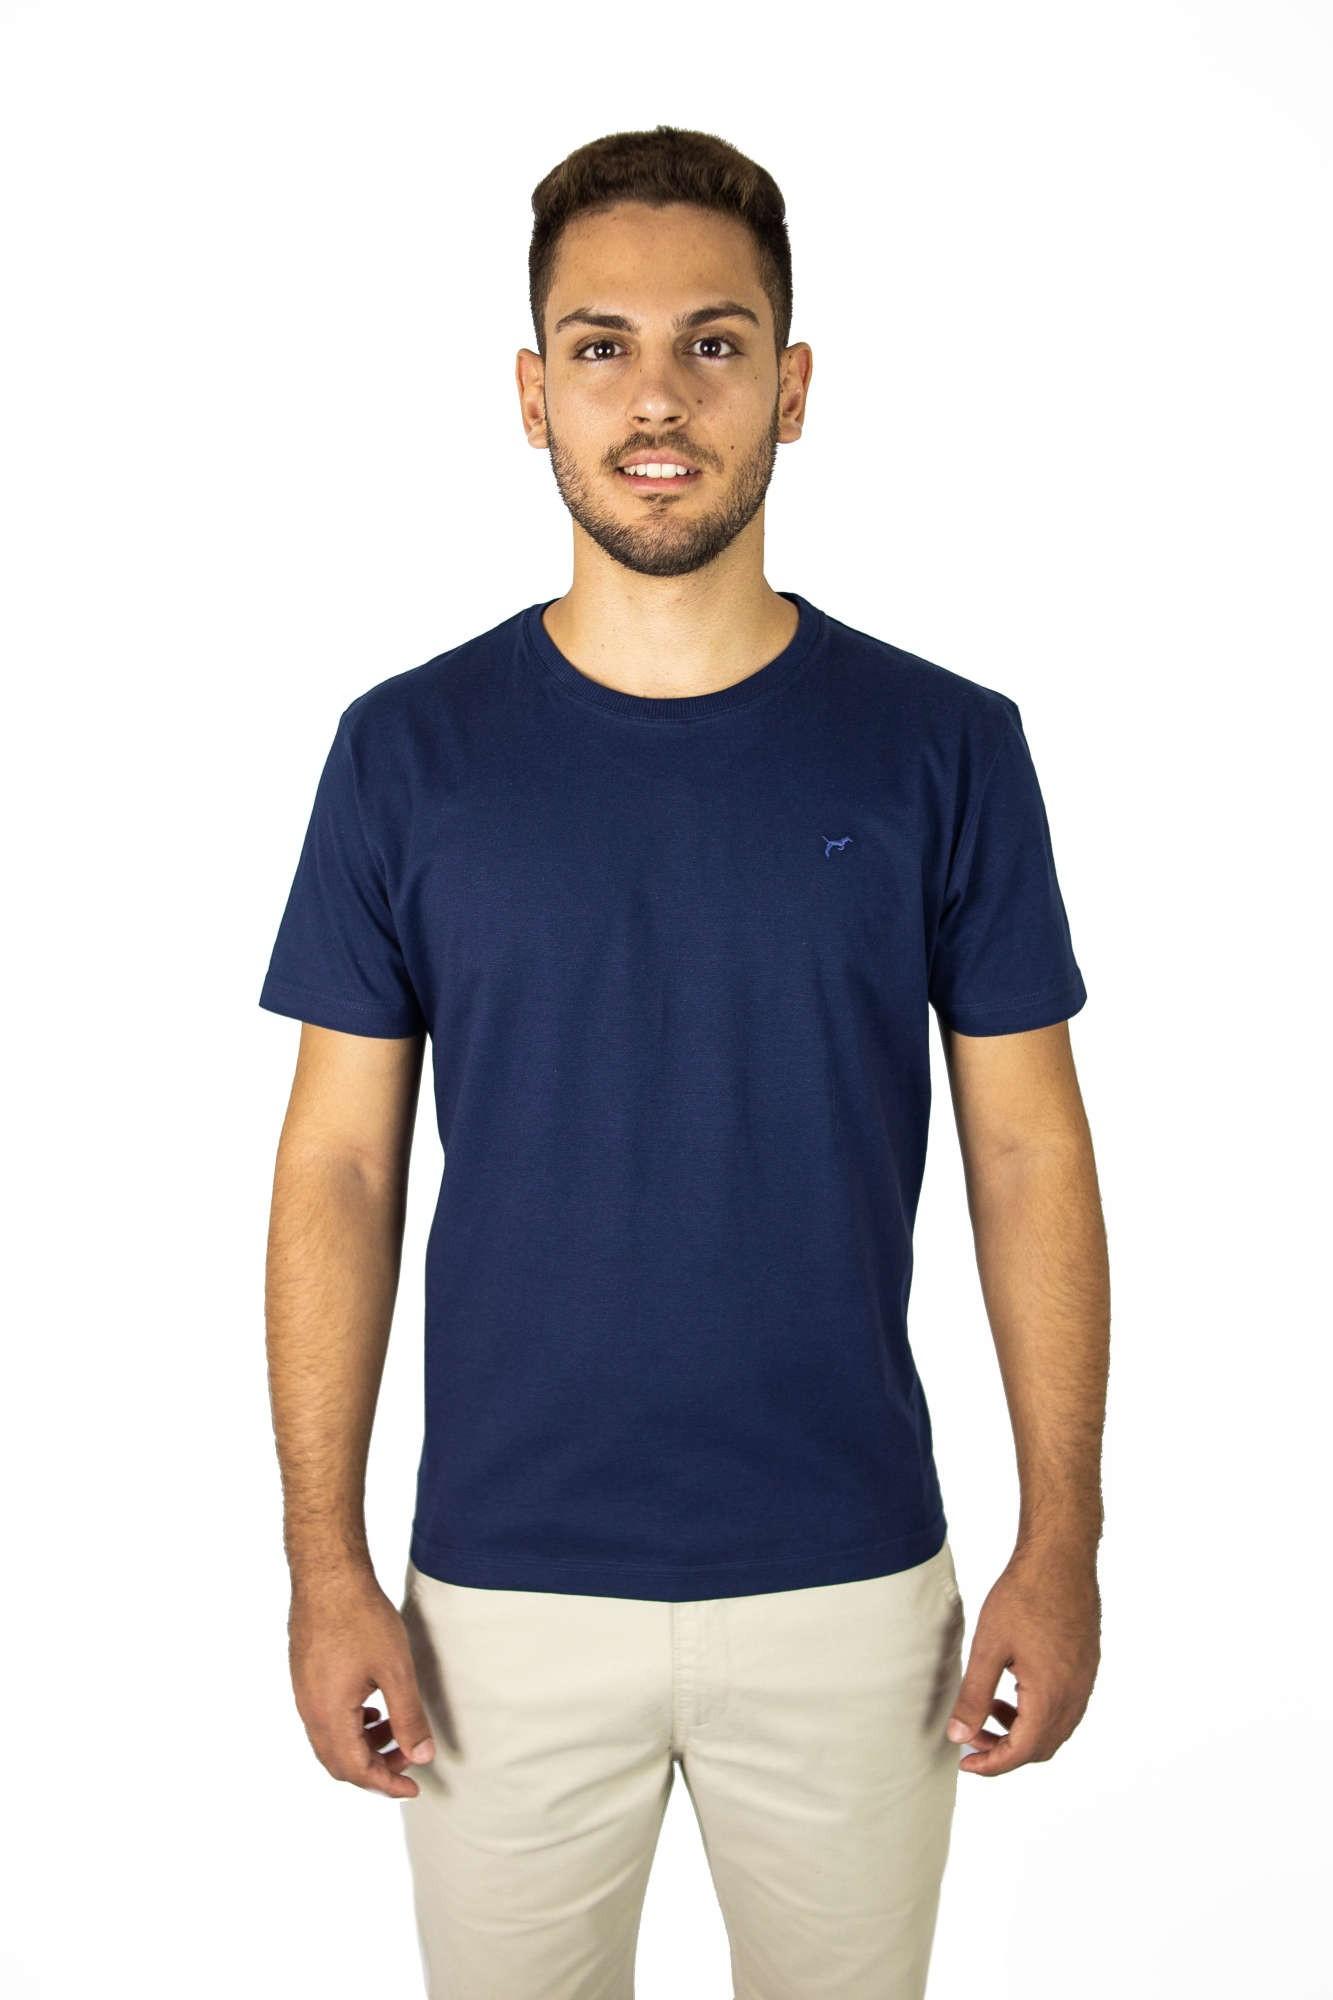 Camiseta Careca Básica